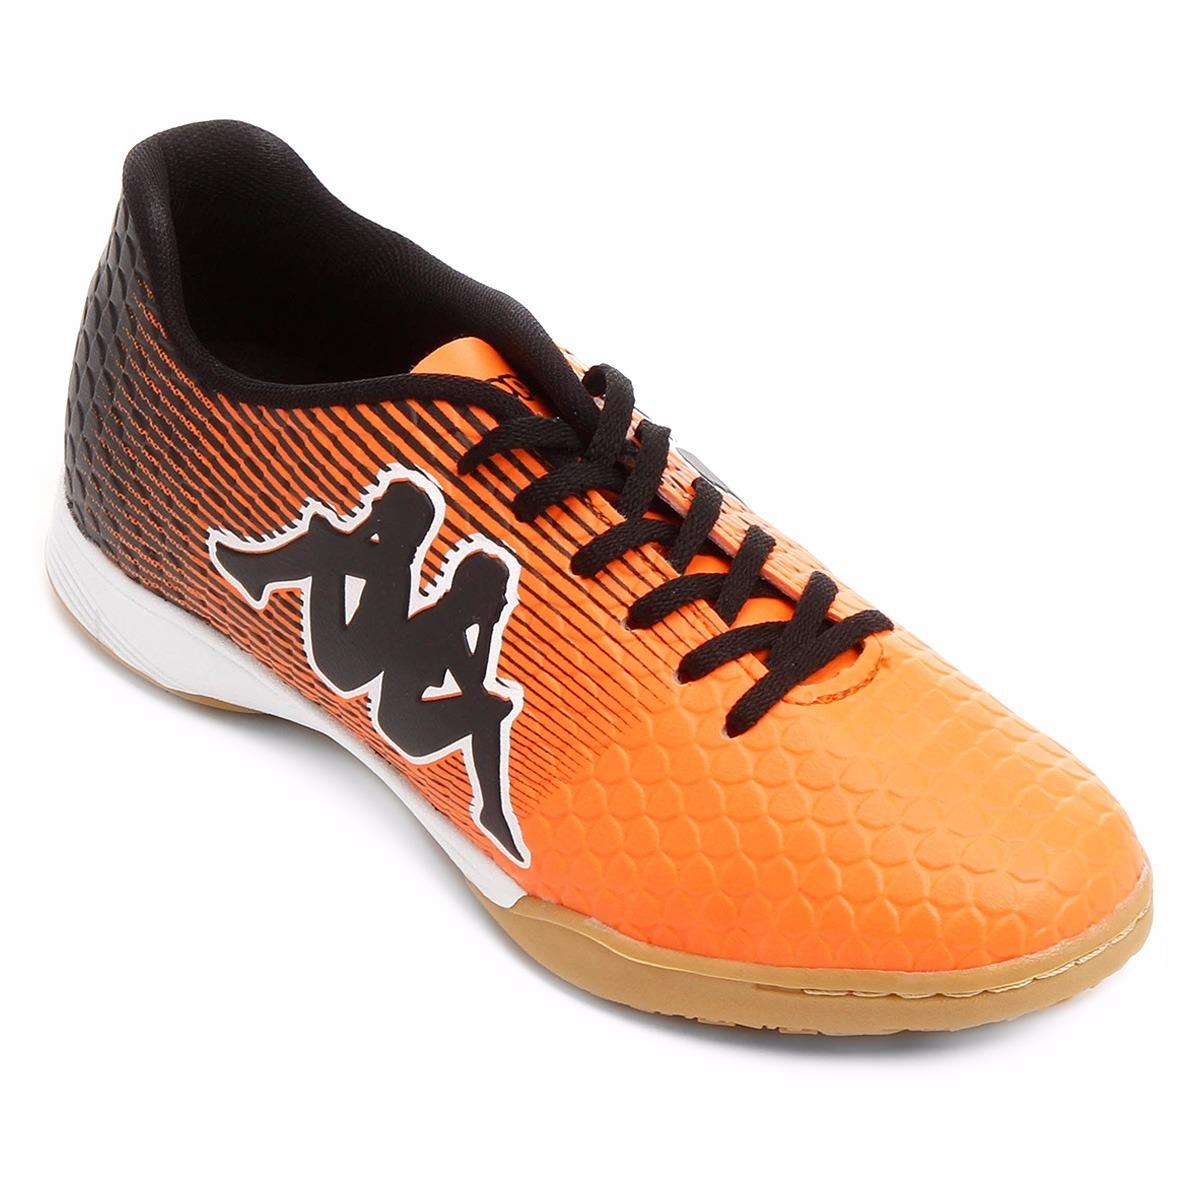 699e0faab9 chuteira futsal kappa fortore original laranja e preto. Carregando zoom.